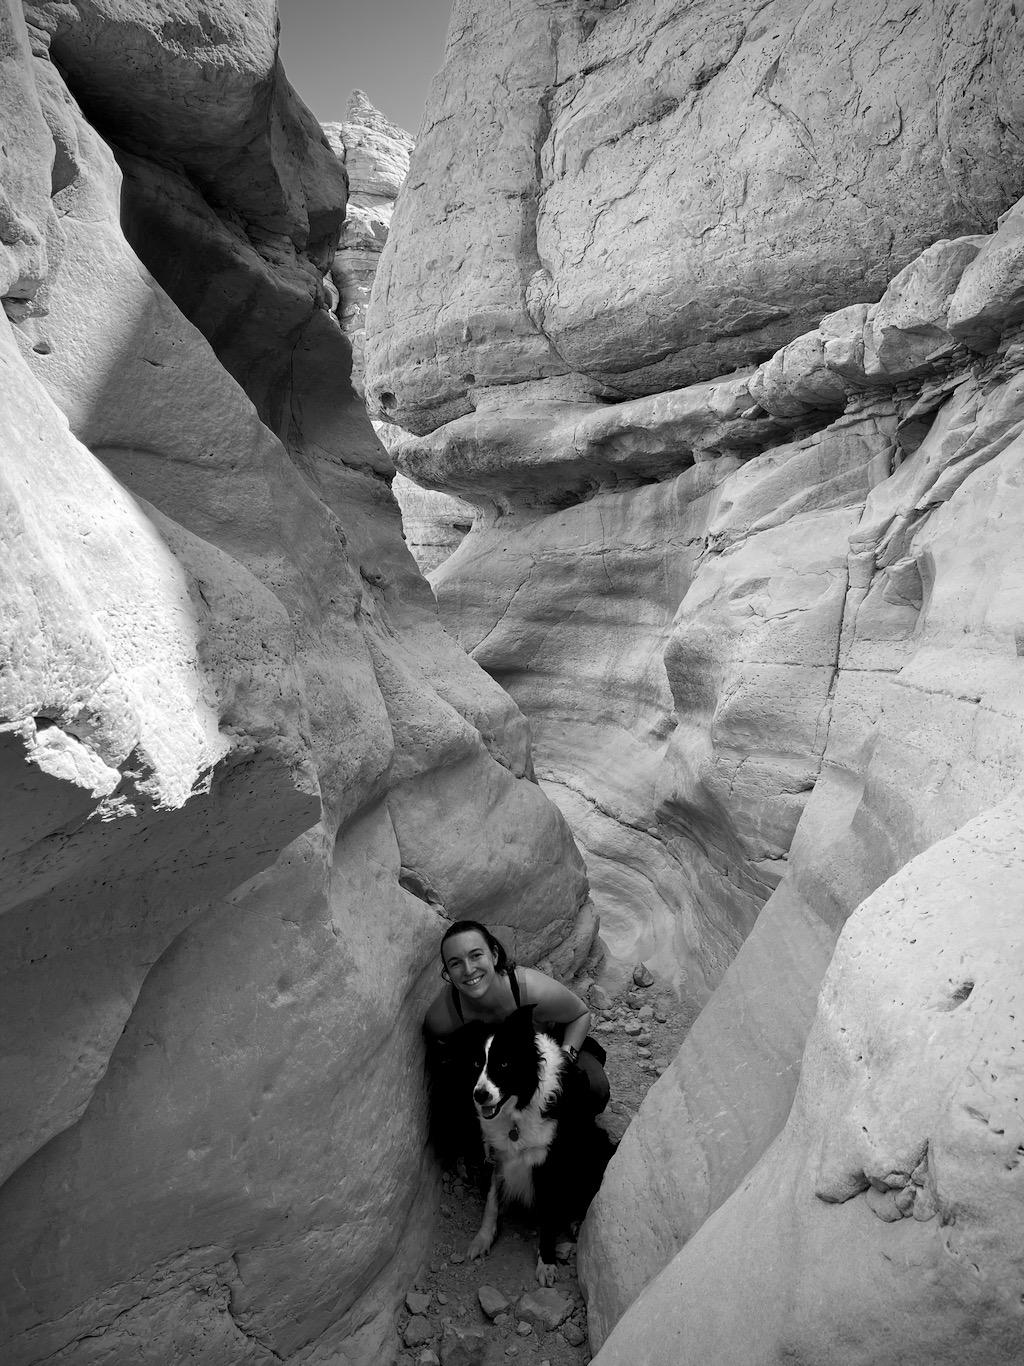 Climbing through the slot canyon at Plaza Bianco.